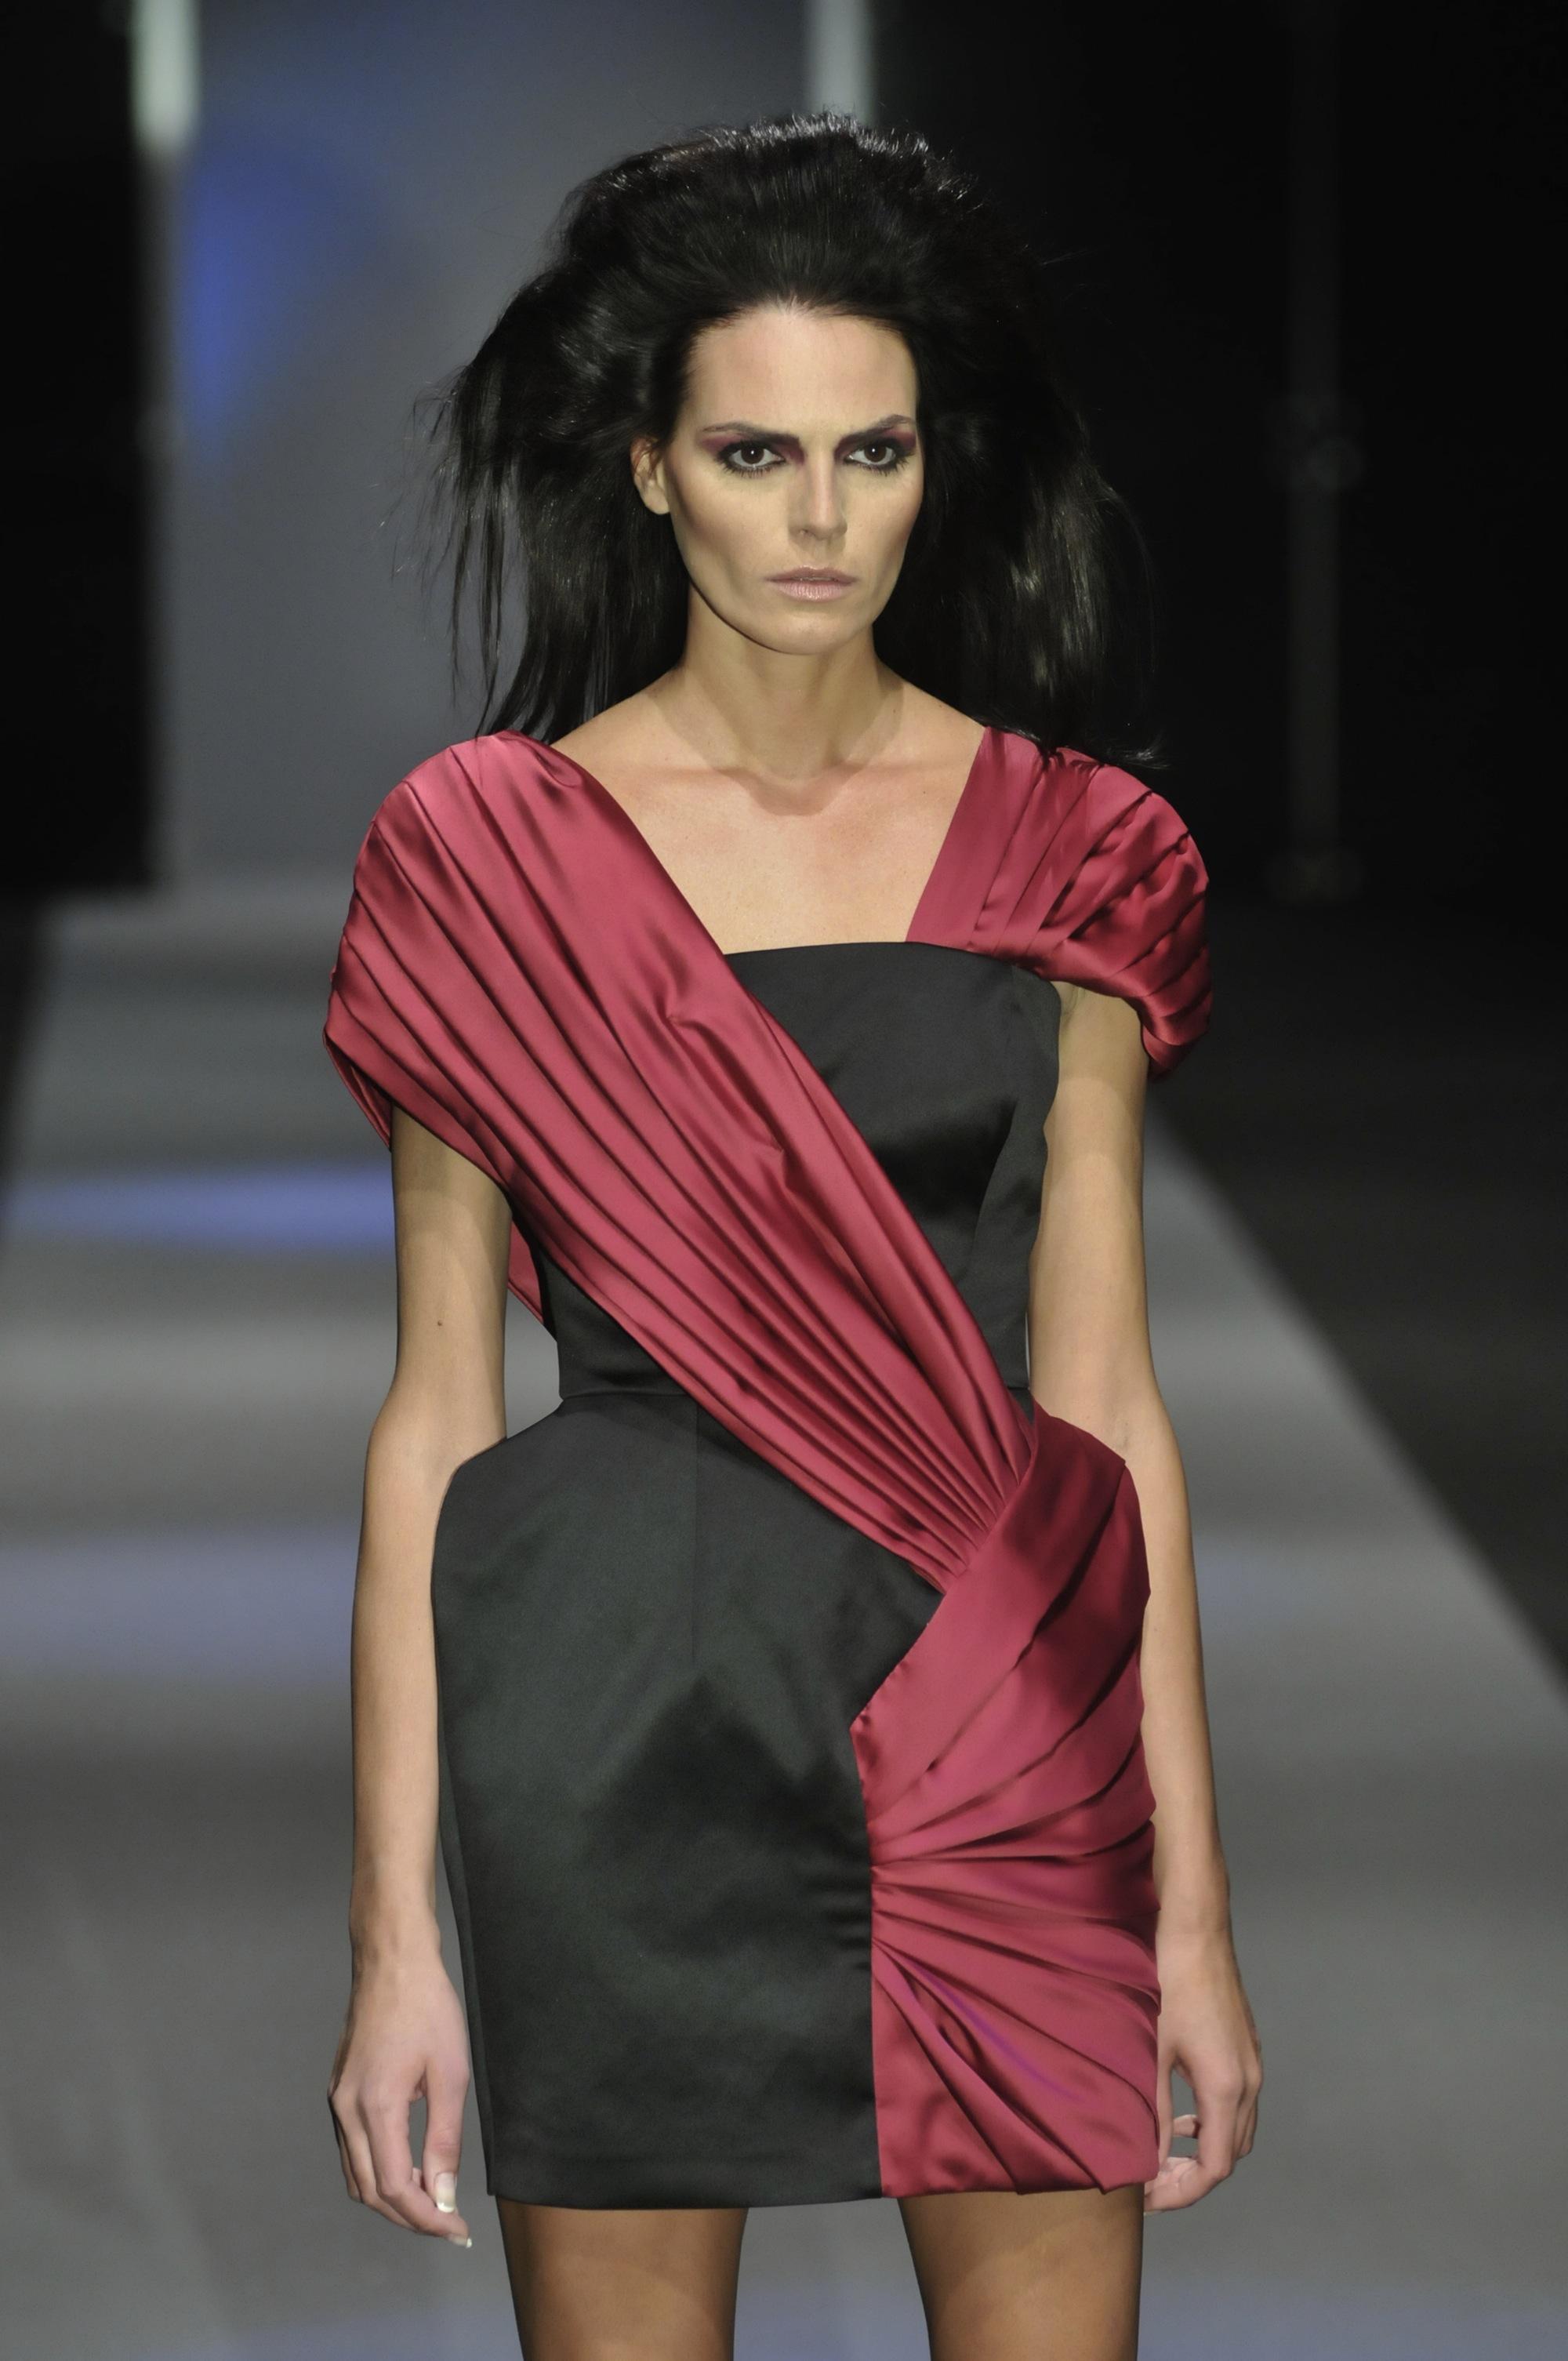 marta miljanic 3 Osmo veče 30. Amstel Fashion Week a